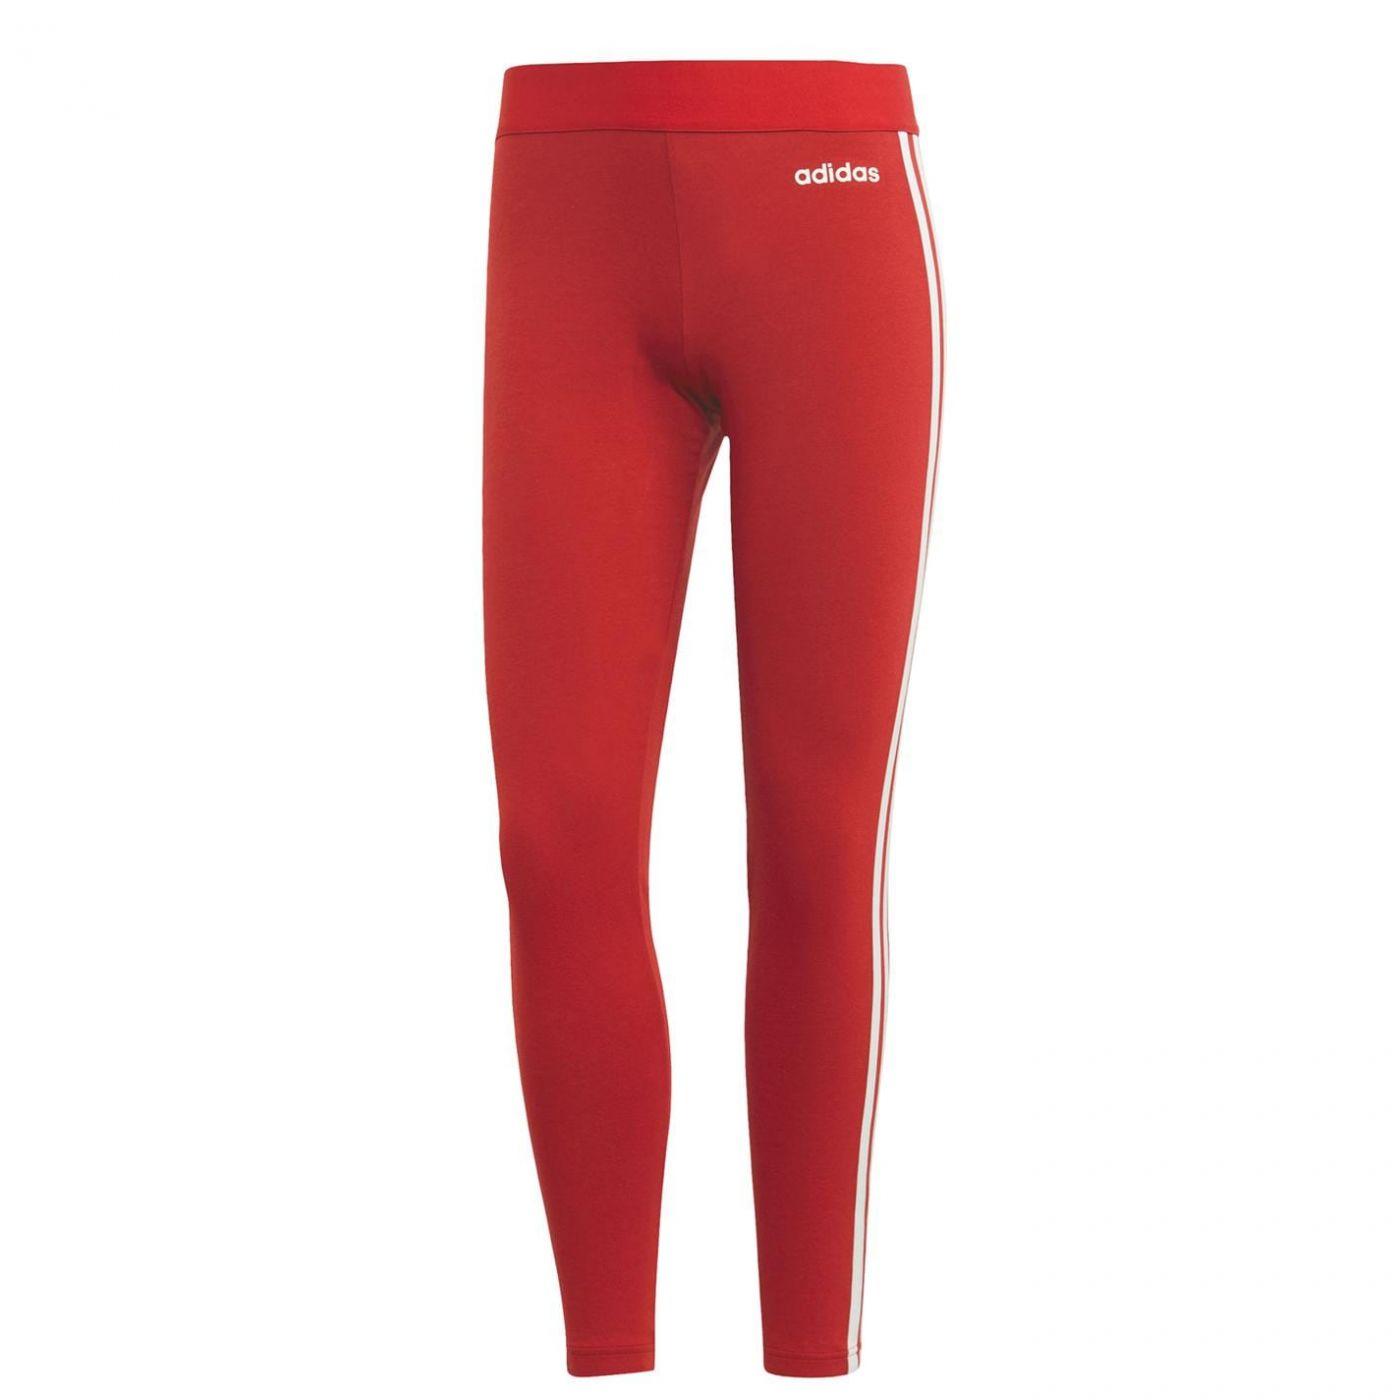 Women's Leggings Adidas Striped